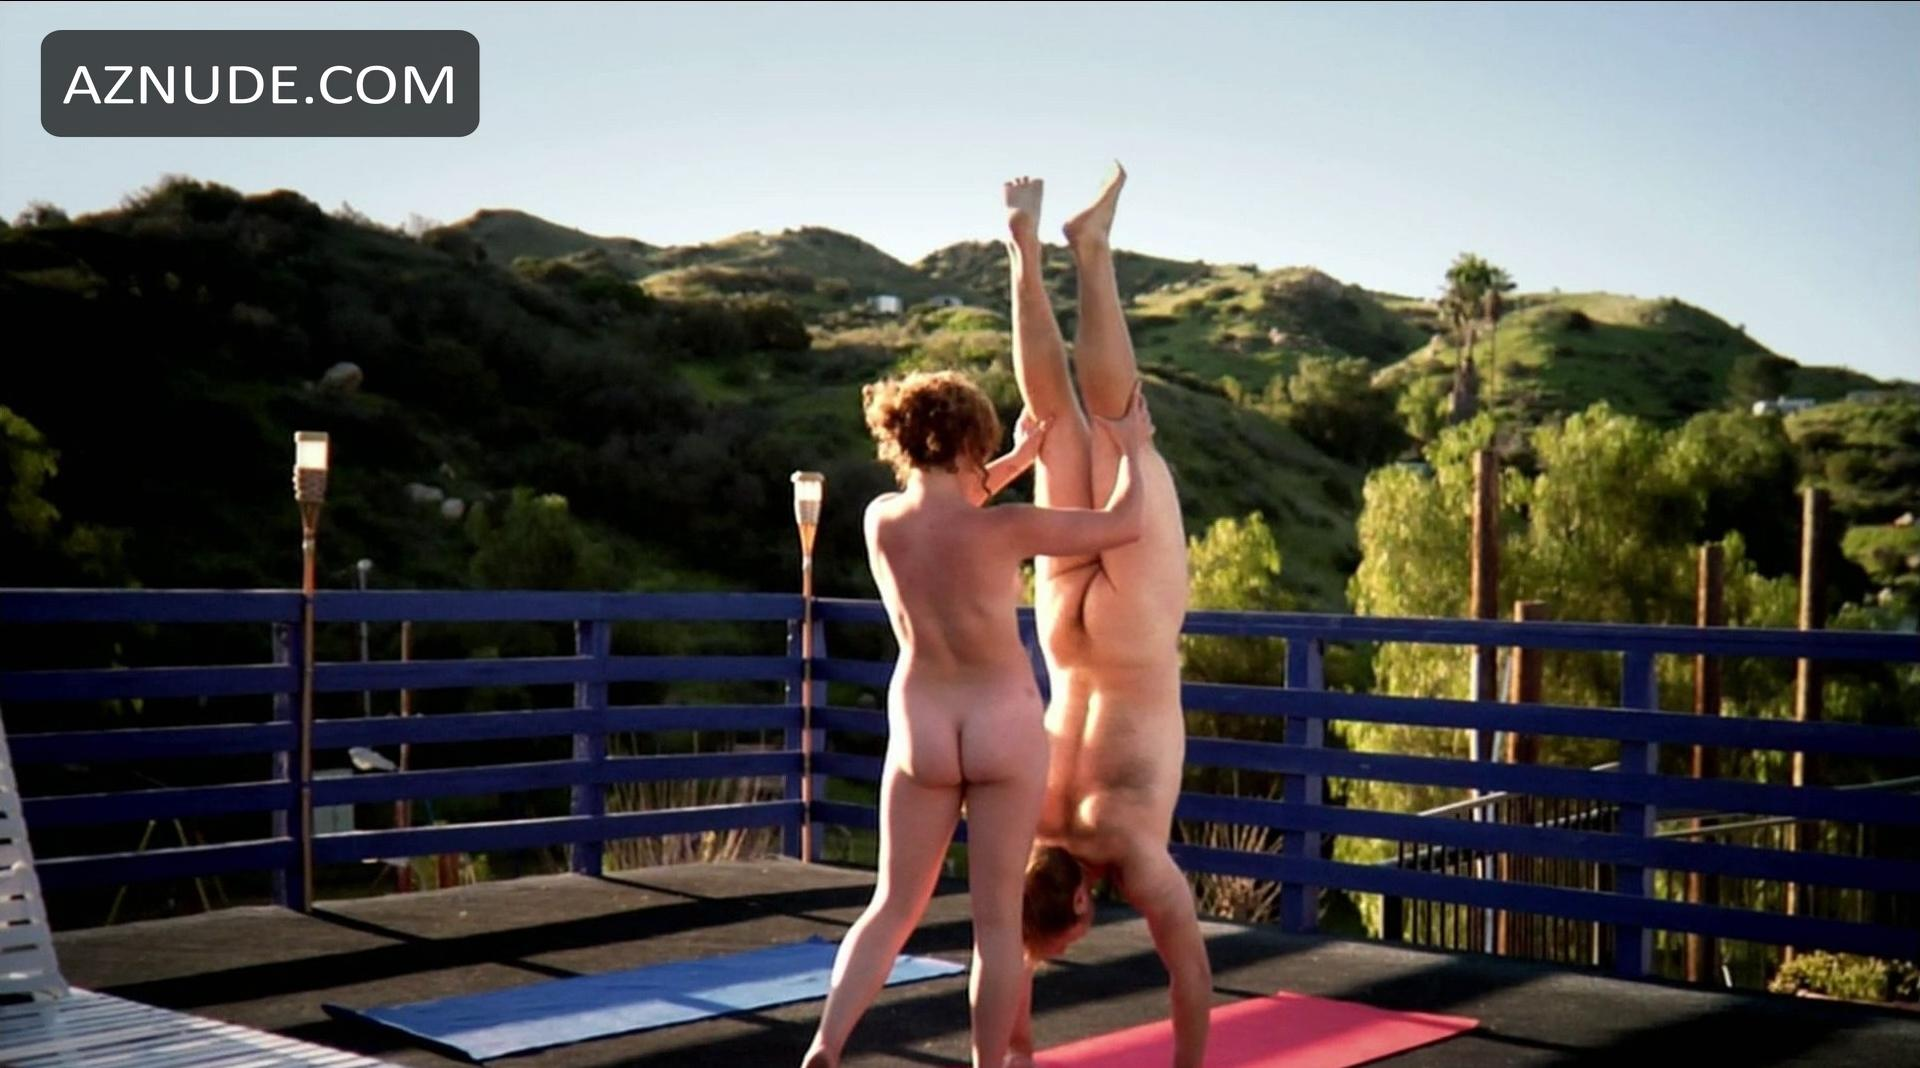 Courtney abbott nude act naturally hd - 2 part 6